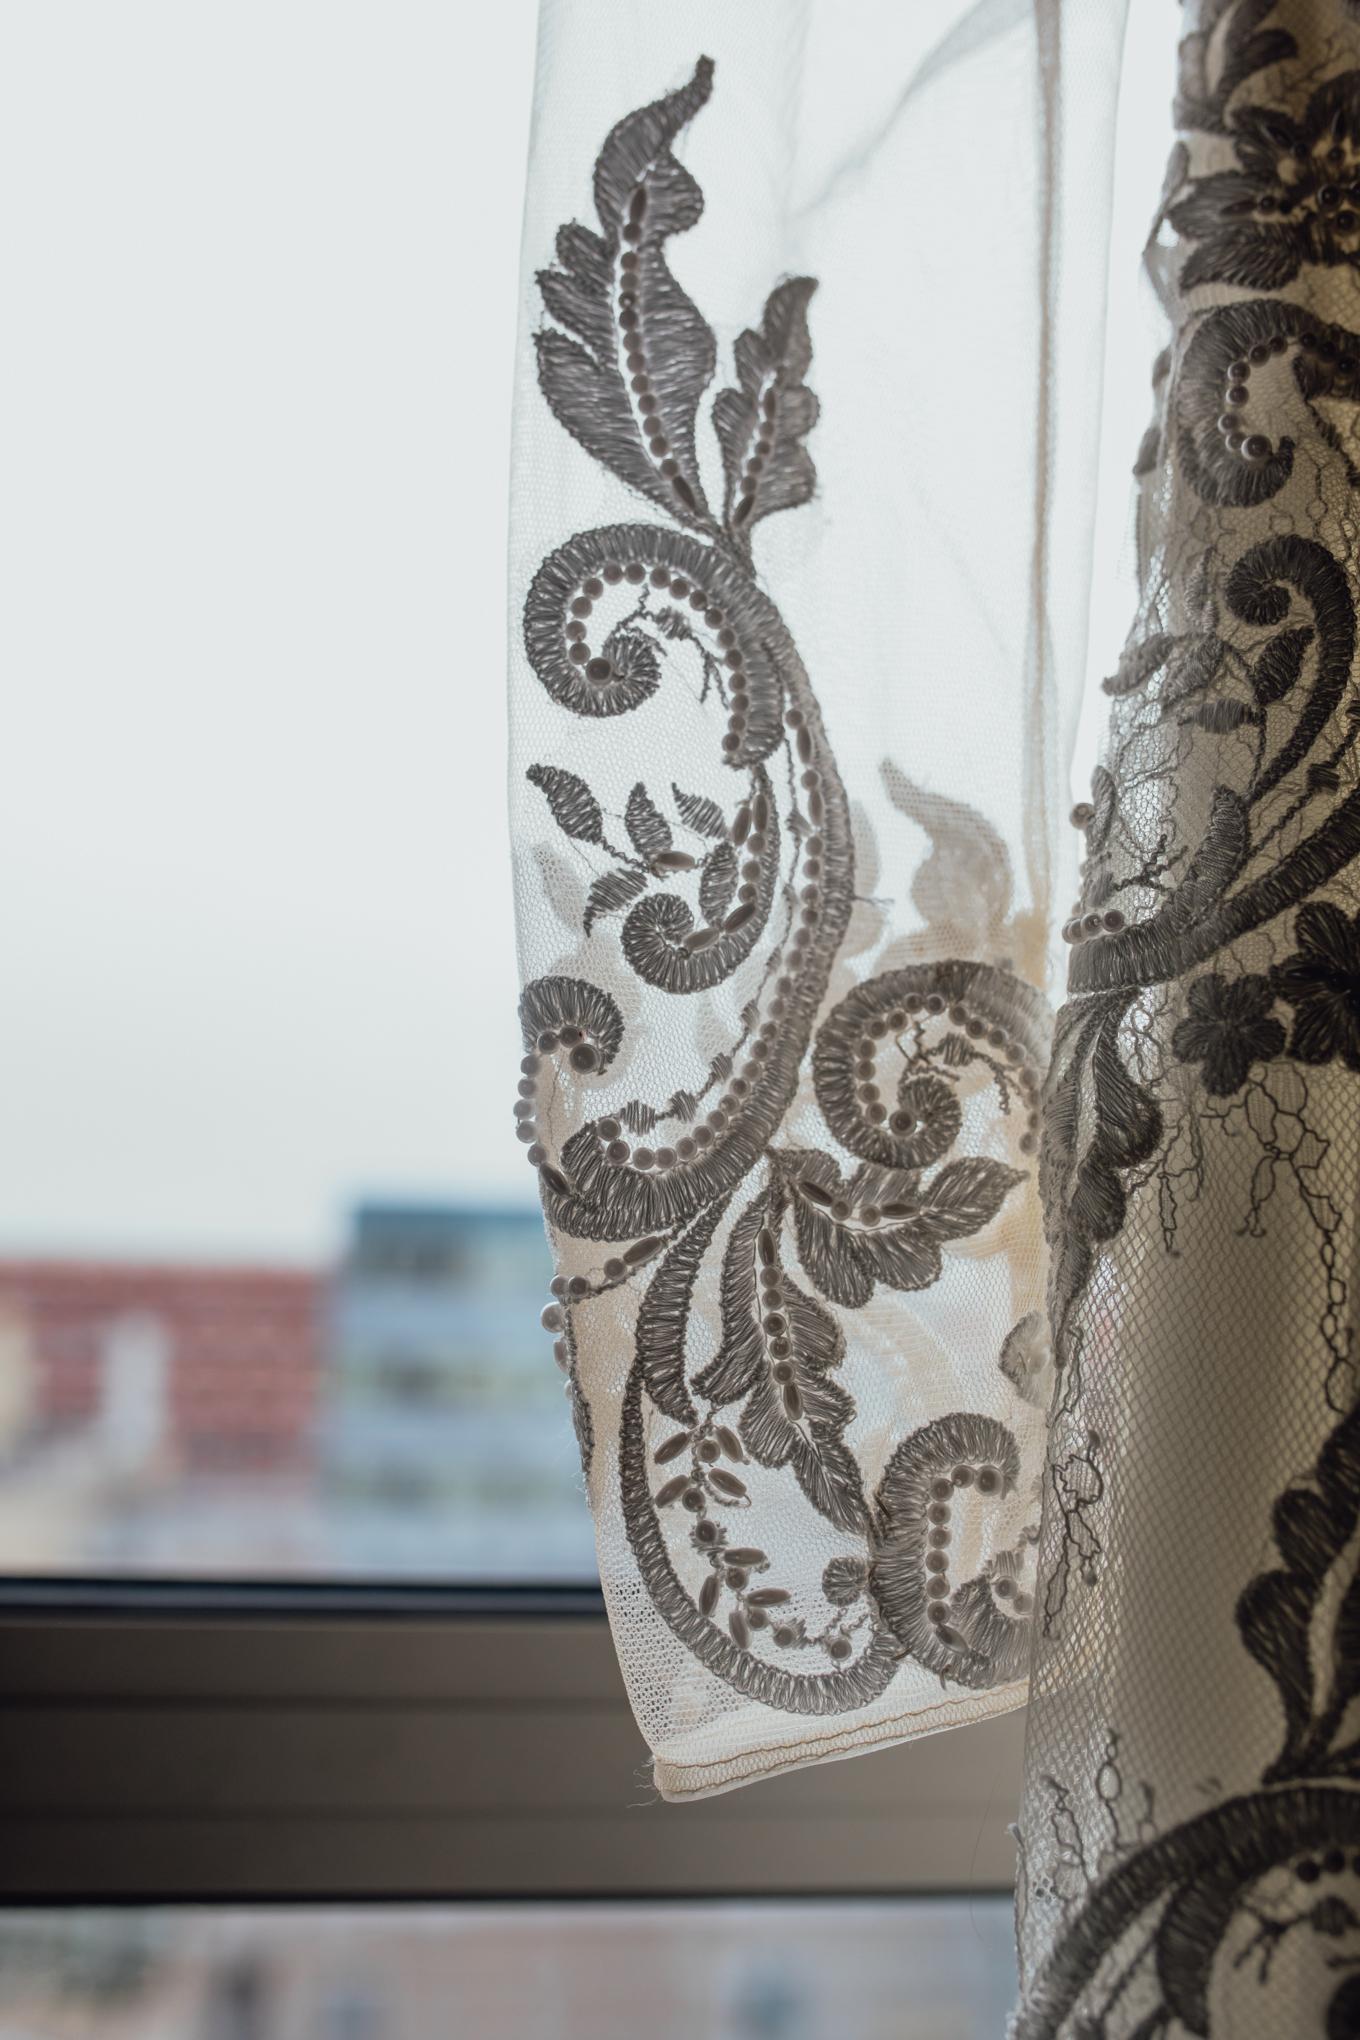 brides-wedding-dress-hanging-in-window.jpg